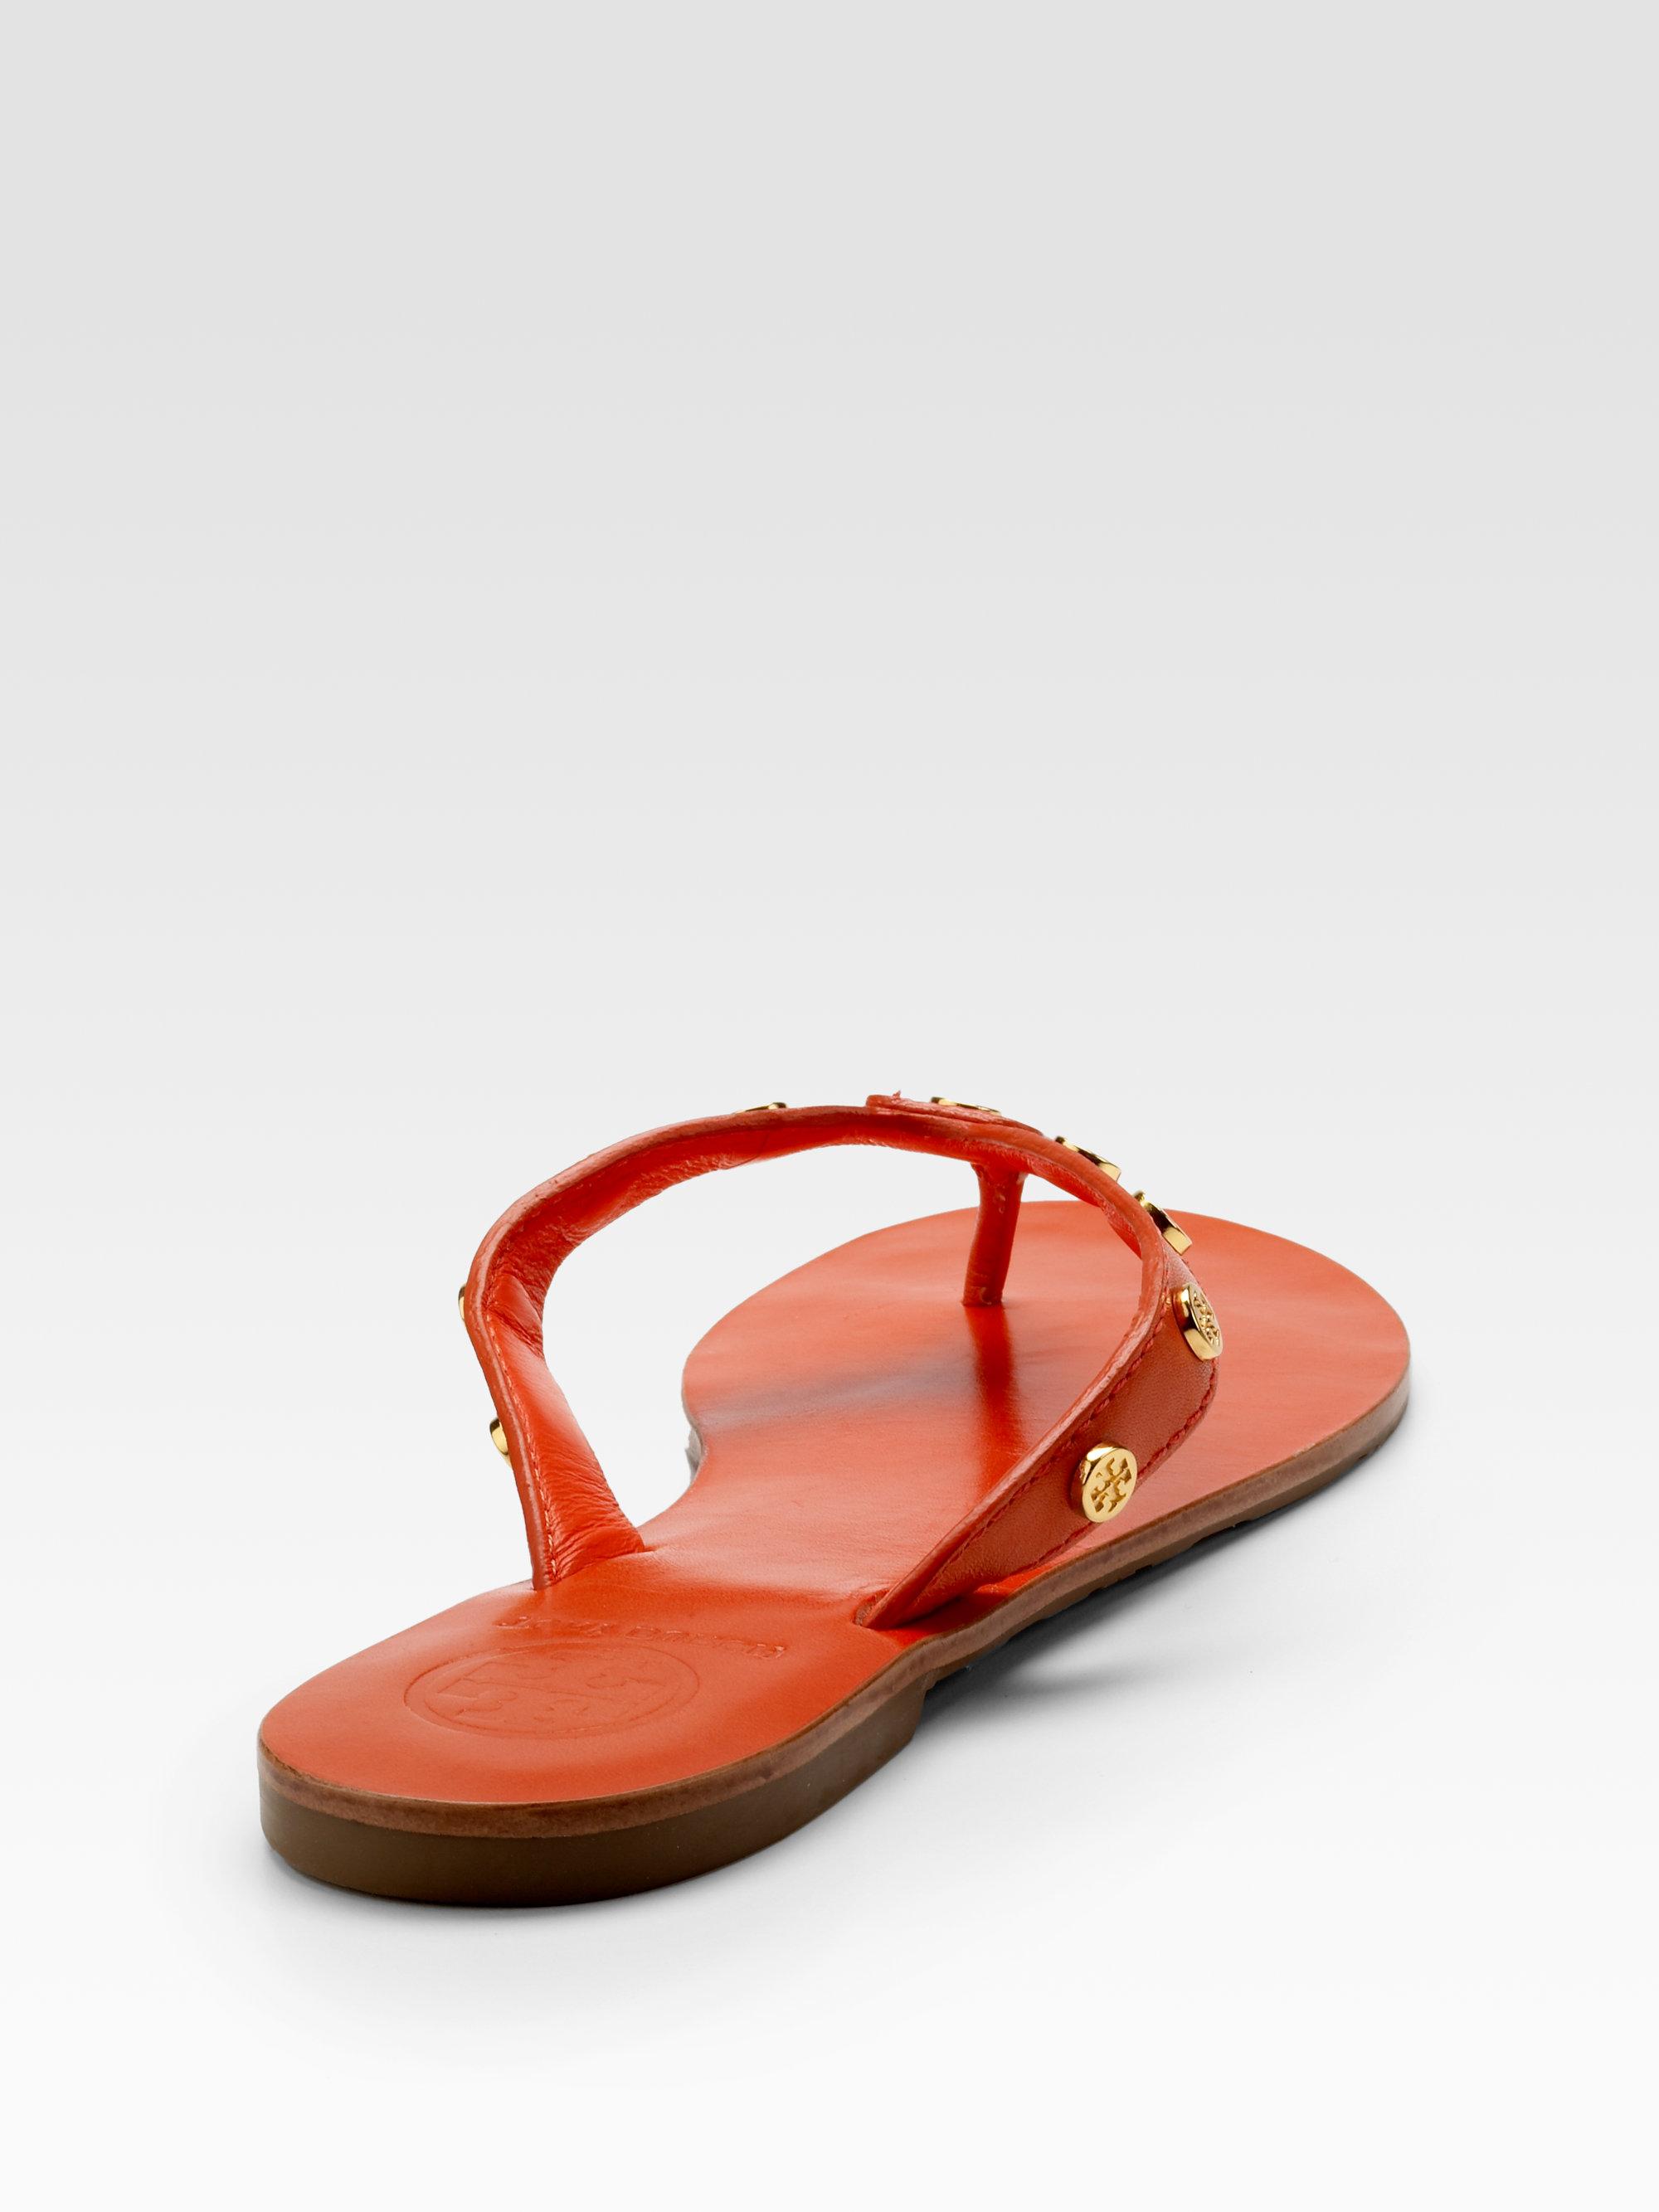 Tory Burch Sav Studded Flip Flops In Orange - Lyst-4222